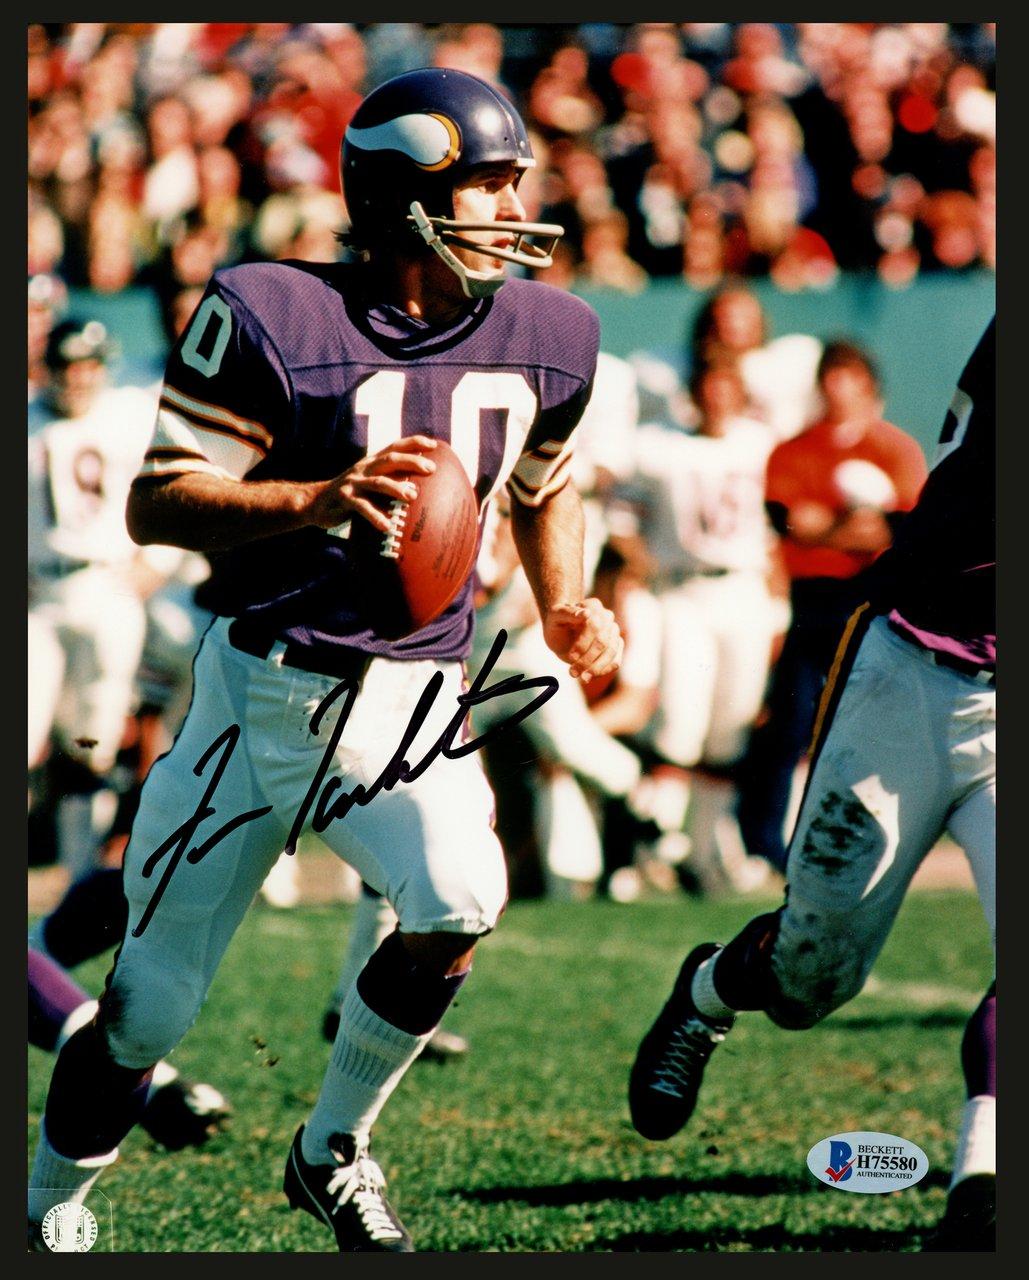 Fran Tarkenton Minnesota Vikings Autographed Signed 8x10 Photo BECKETT